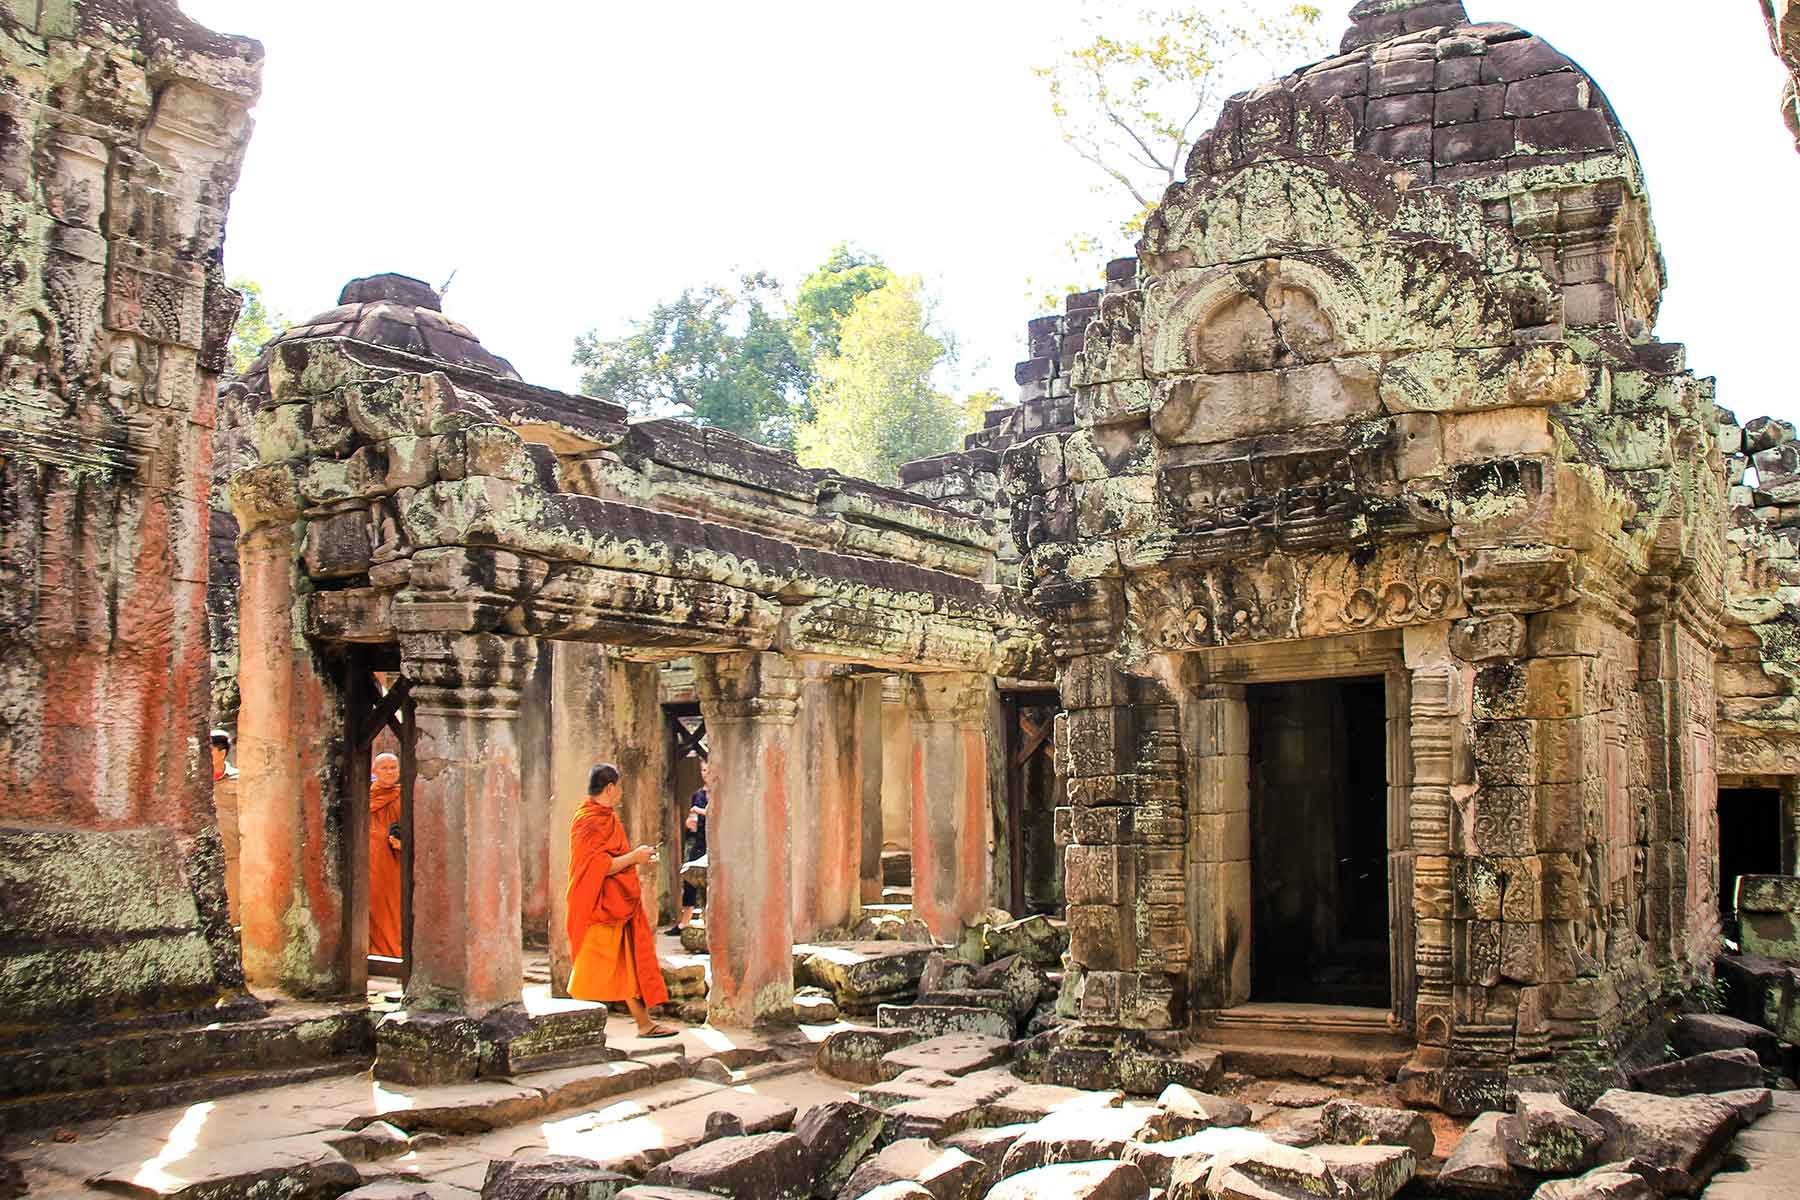 Rundresa-i-Kambodja-med-Angkor-Wat---Nygren-&-Lind-resebyrå---person